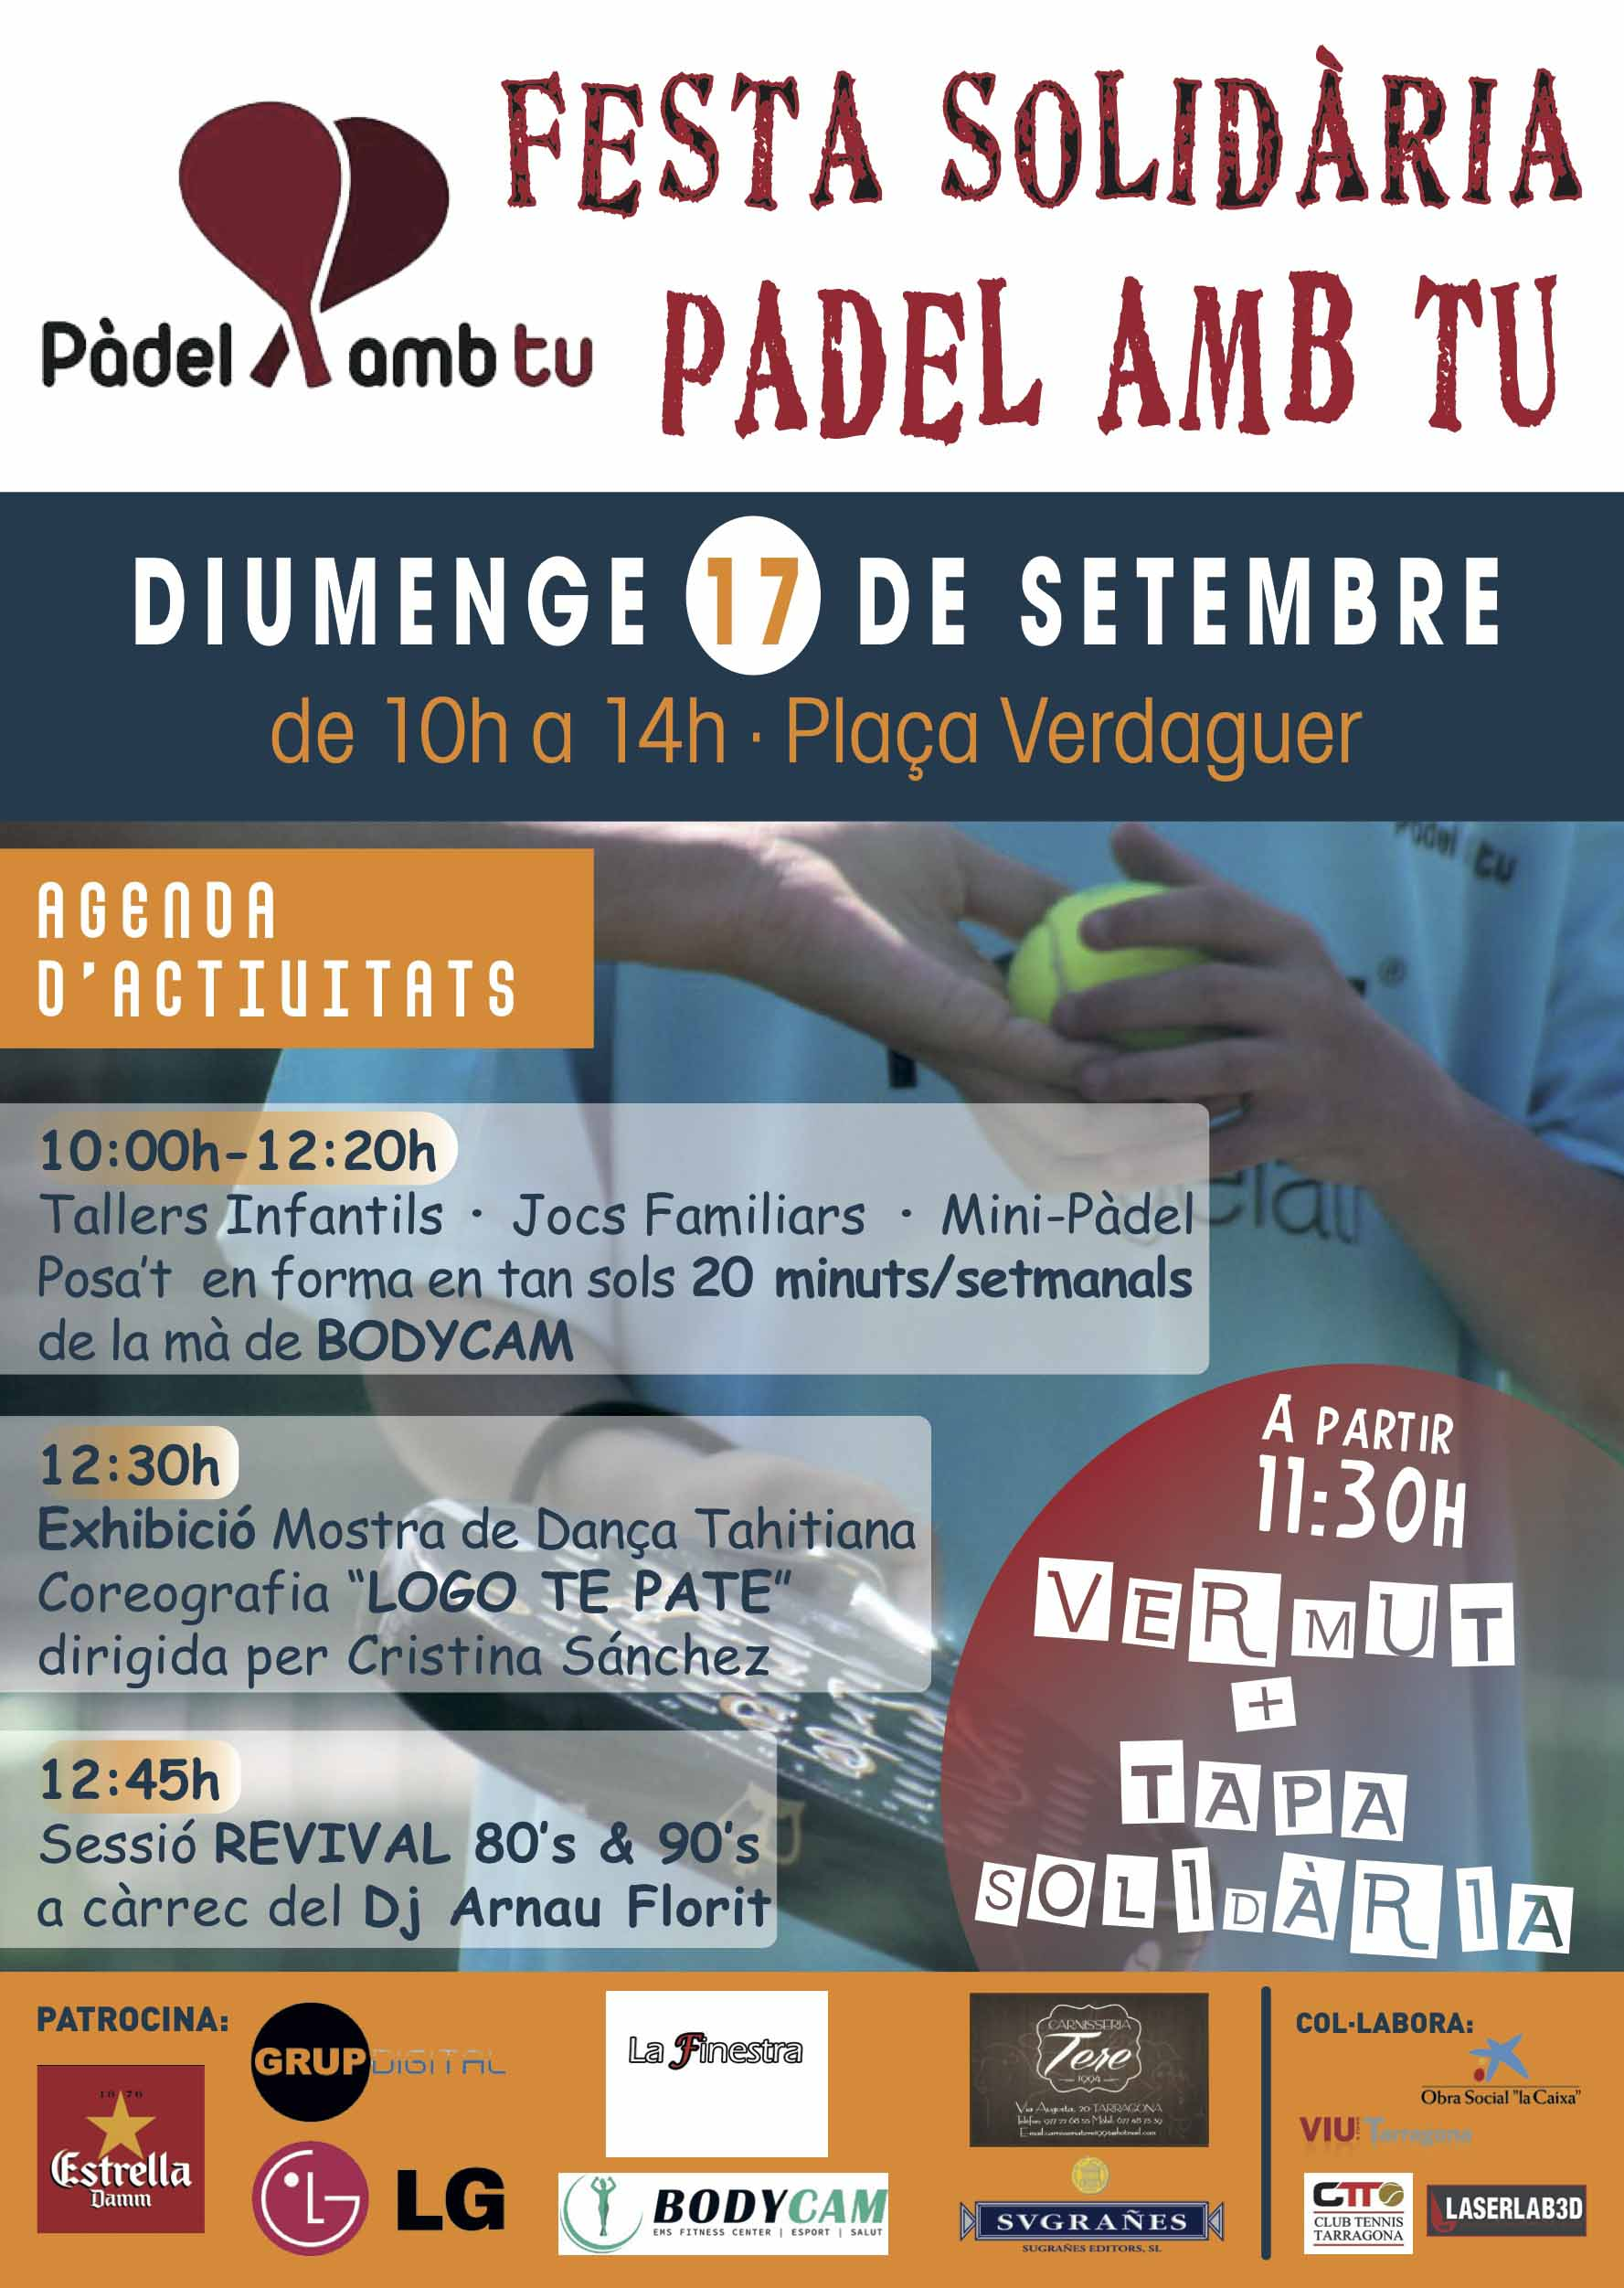 FESTA SOLIDÀRIA PÀDEL AMB TU – Santa Tecla 2017